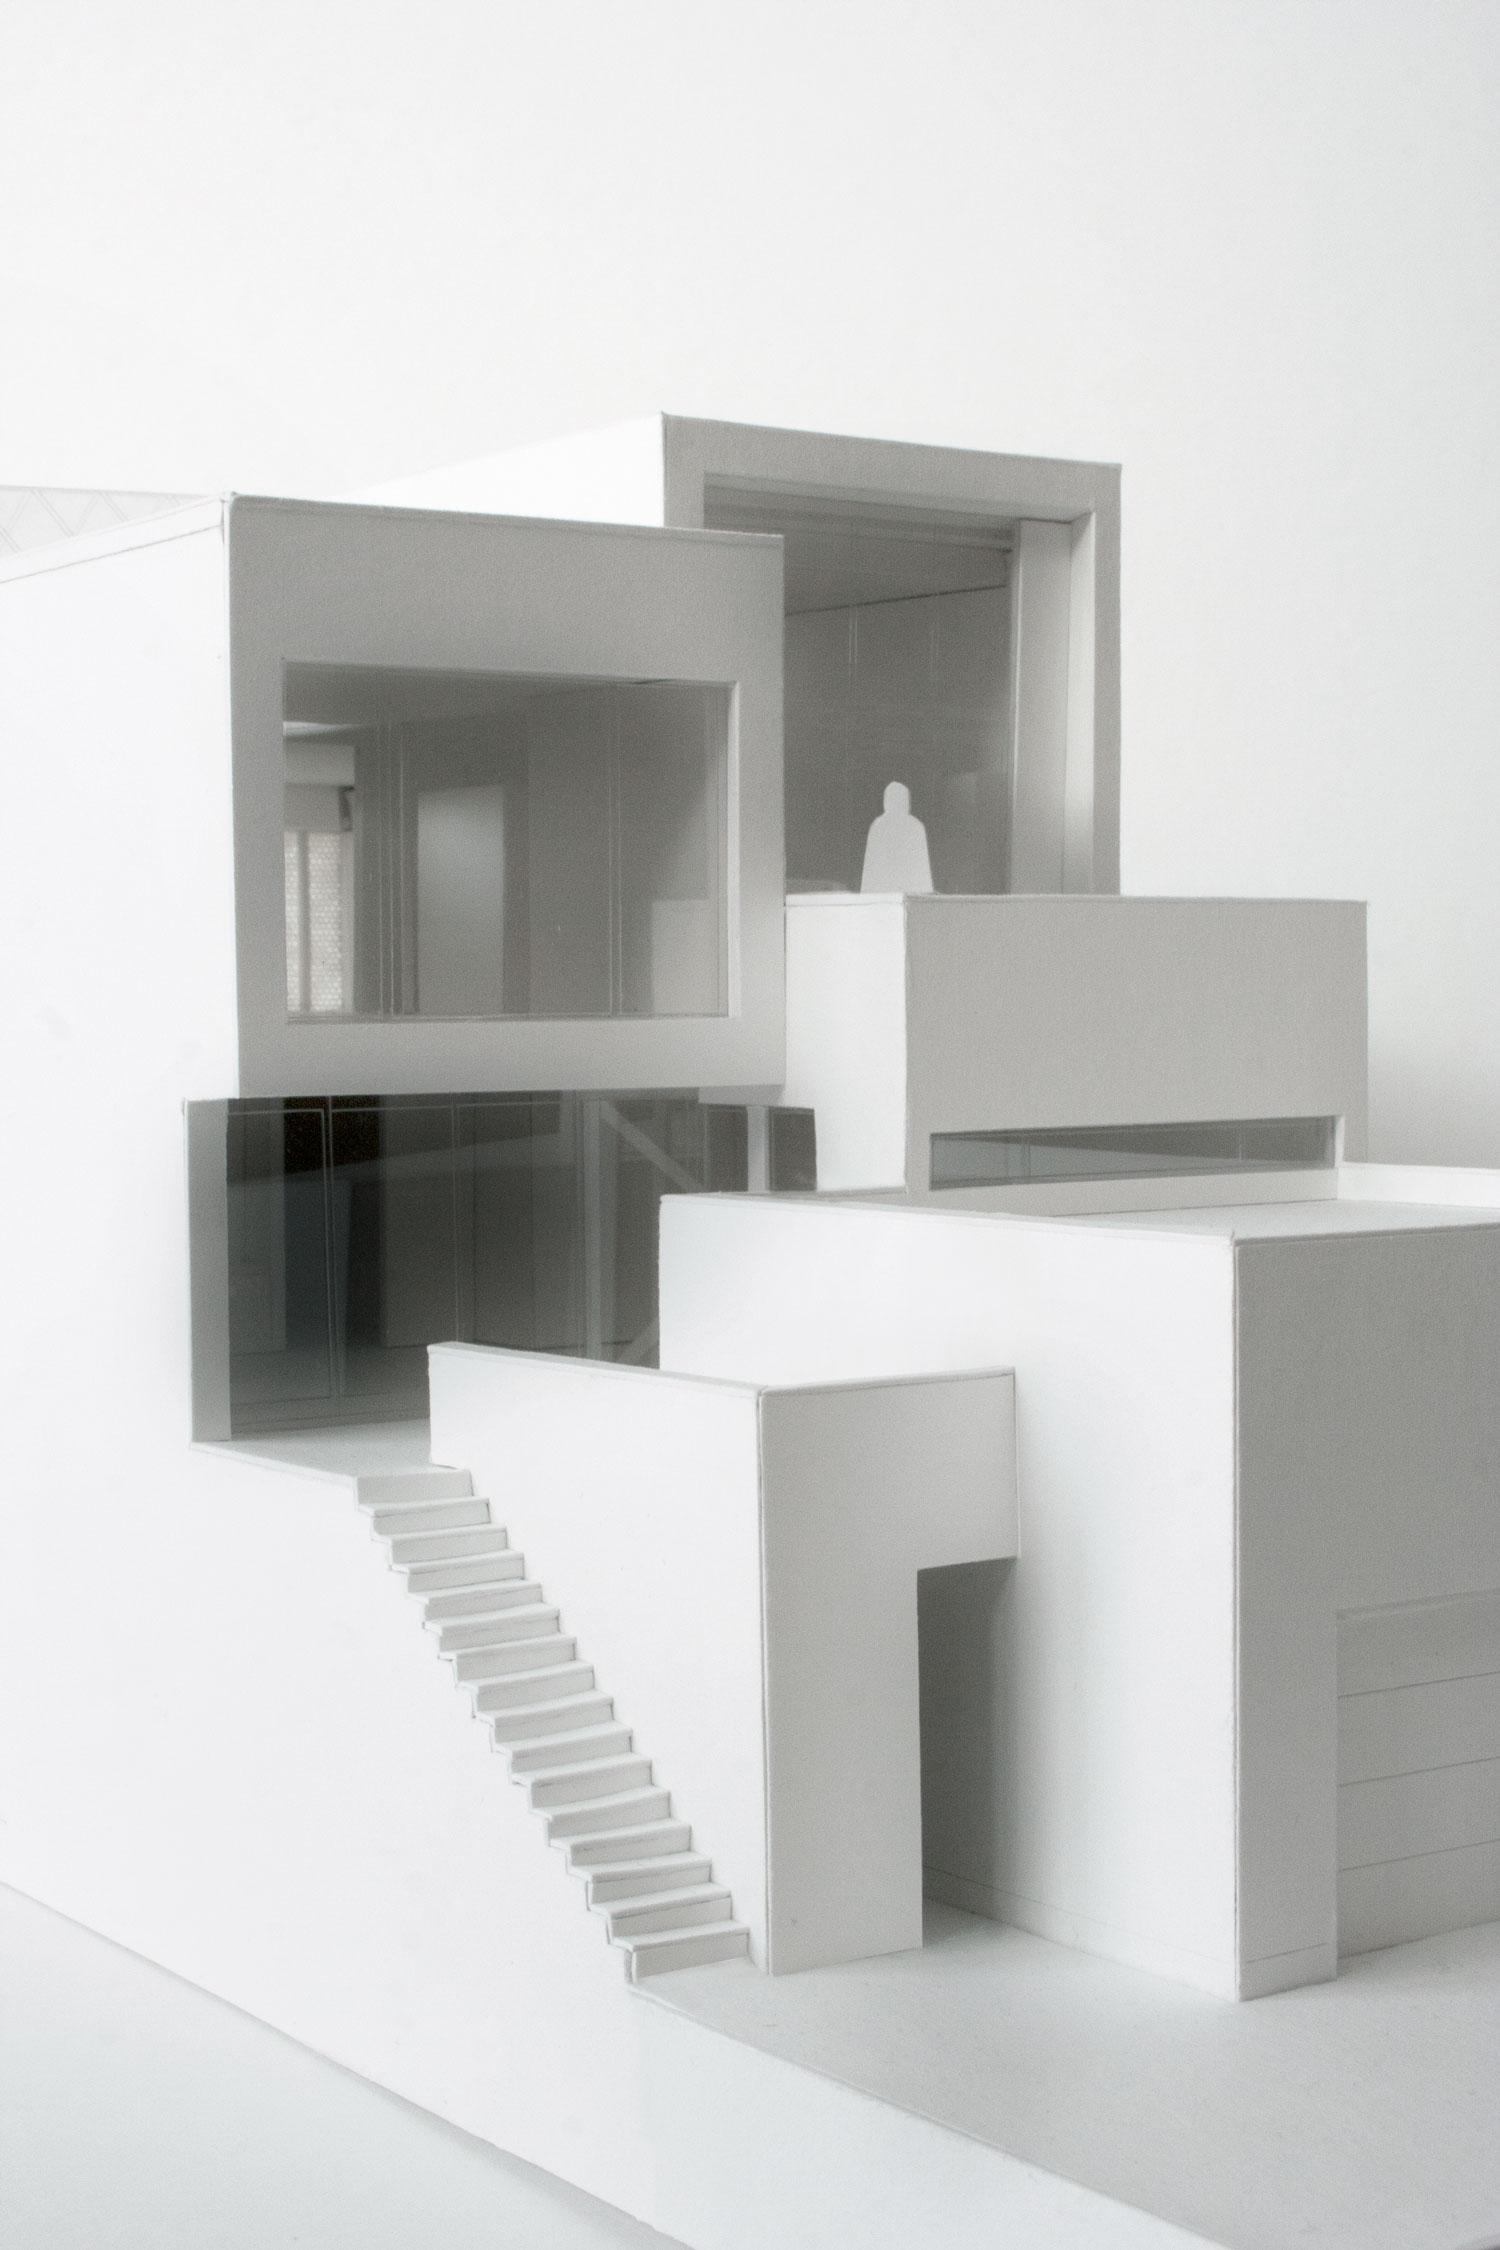 2-paulbernierarchitecte-Van-Horne